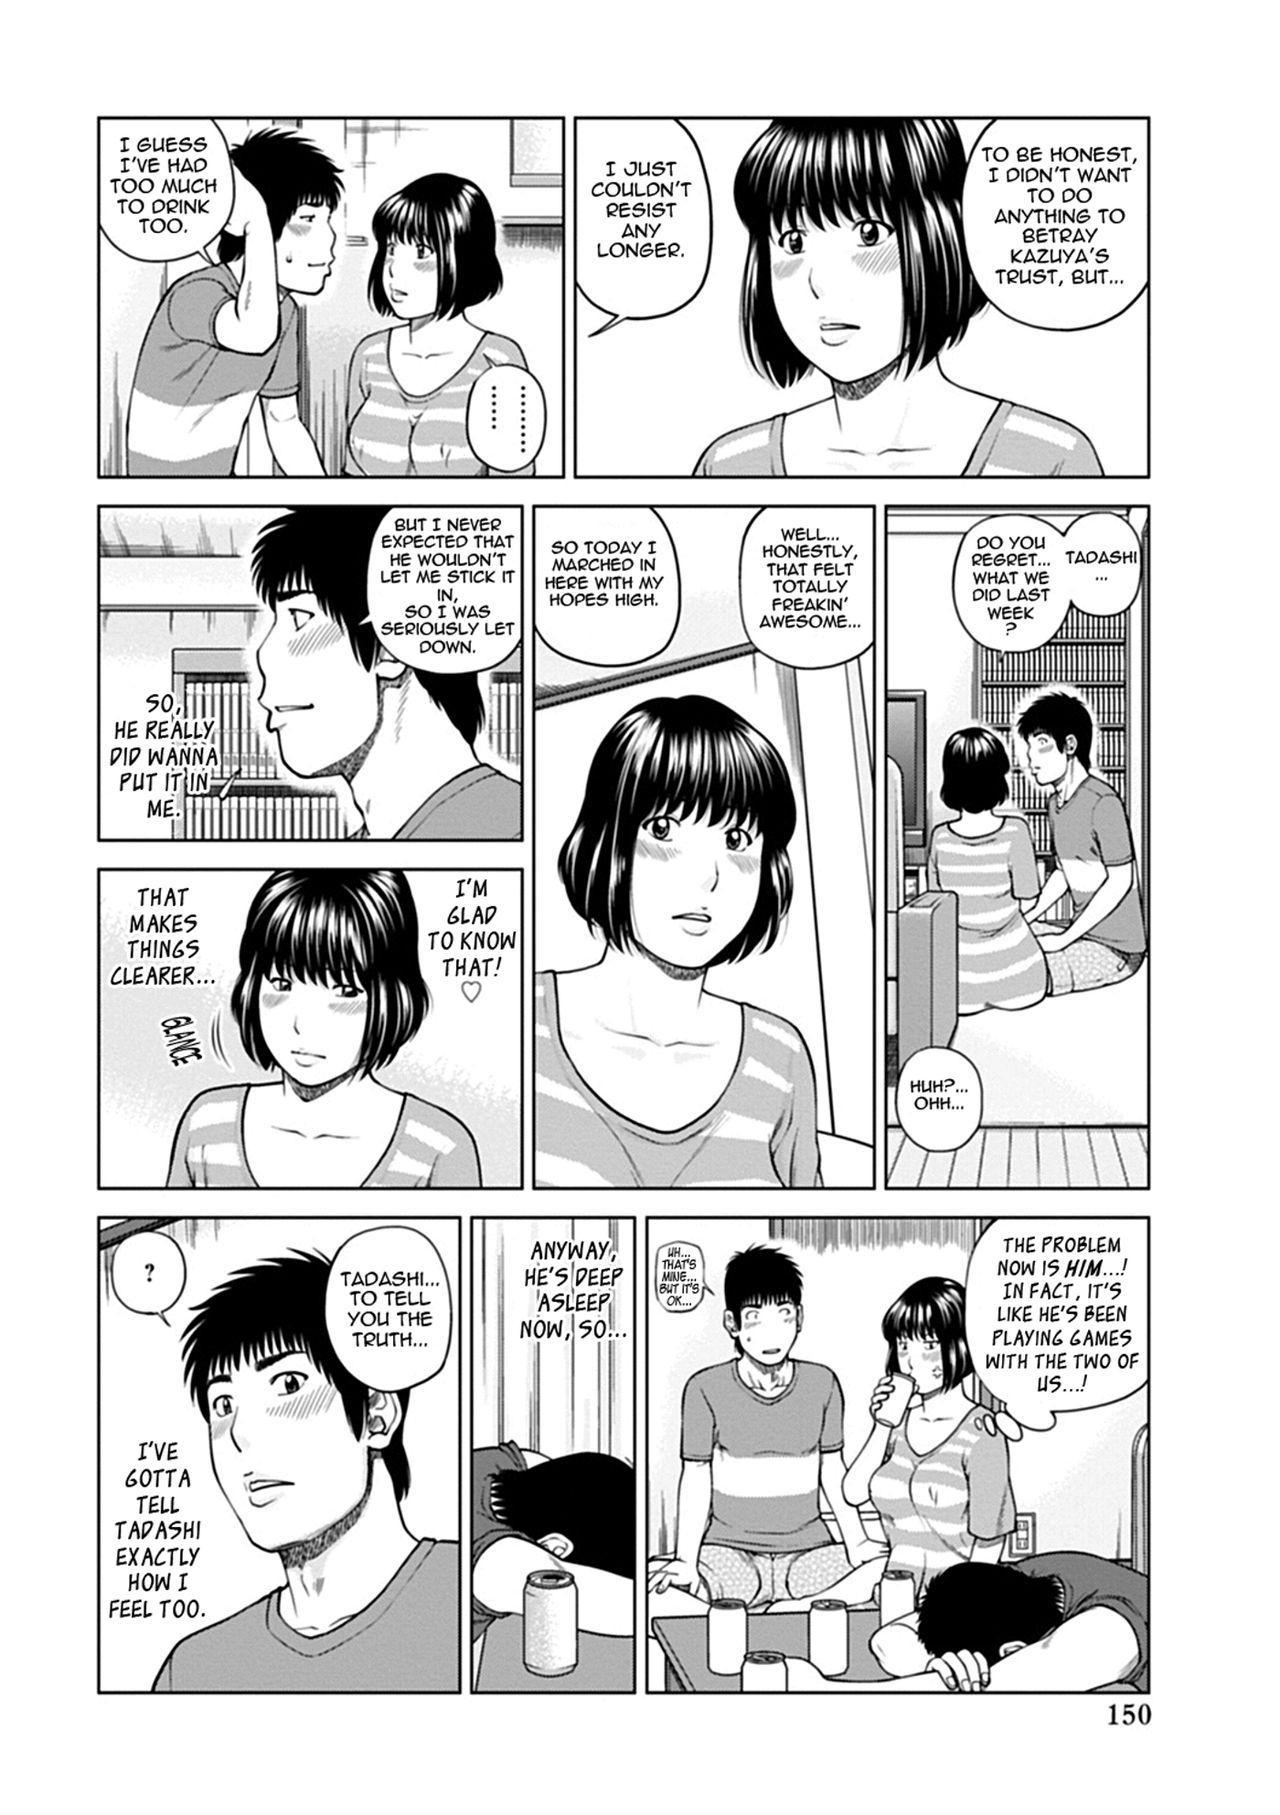 [Kuroki Hidehiko] 36-sai Injuku Sakarizuma | 36-Year-Old Randy Mature Wife [English] {Tadanohito} [Digital] [Uncensored] 143